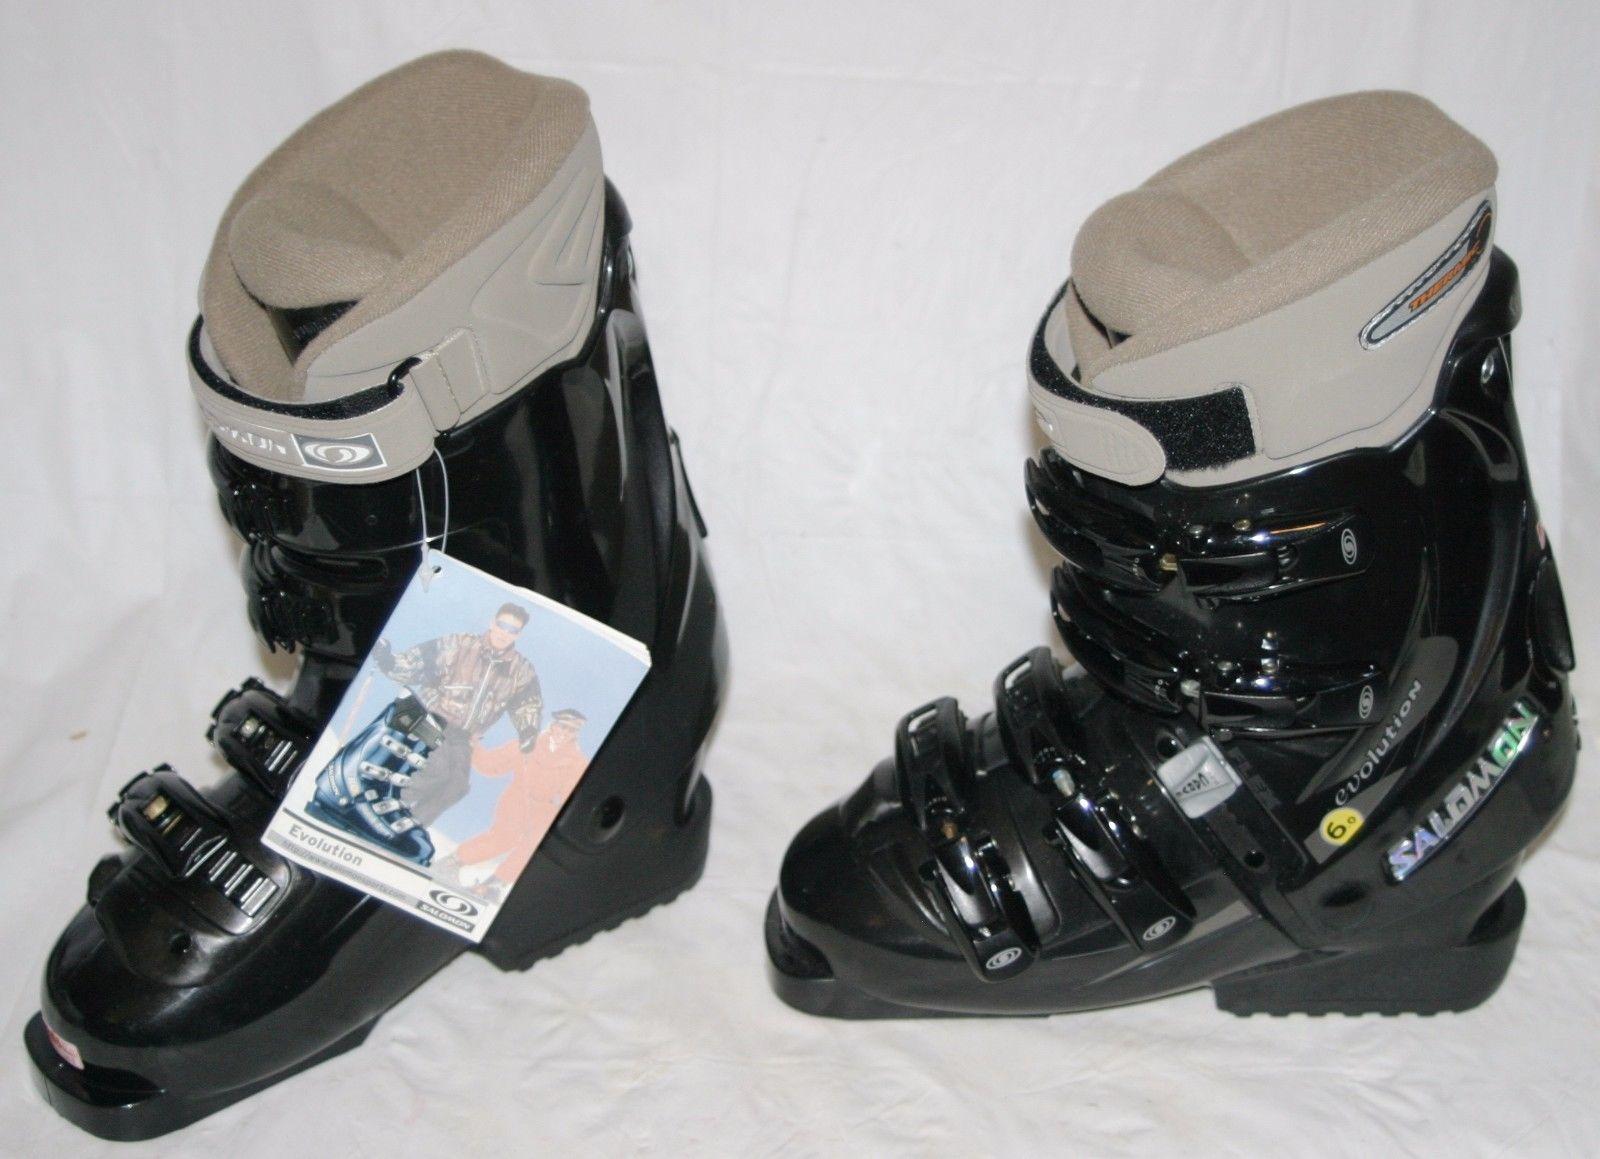 Salomon Evolution 60 Intermediate Ski Boots And 9 Similar Items